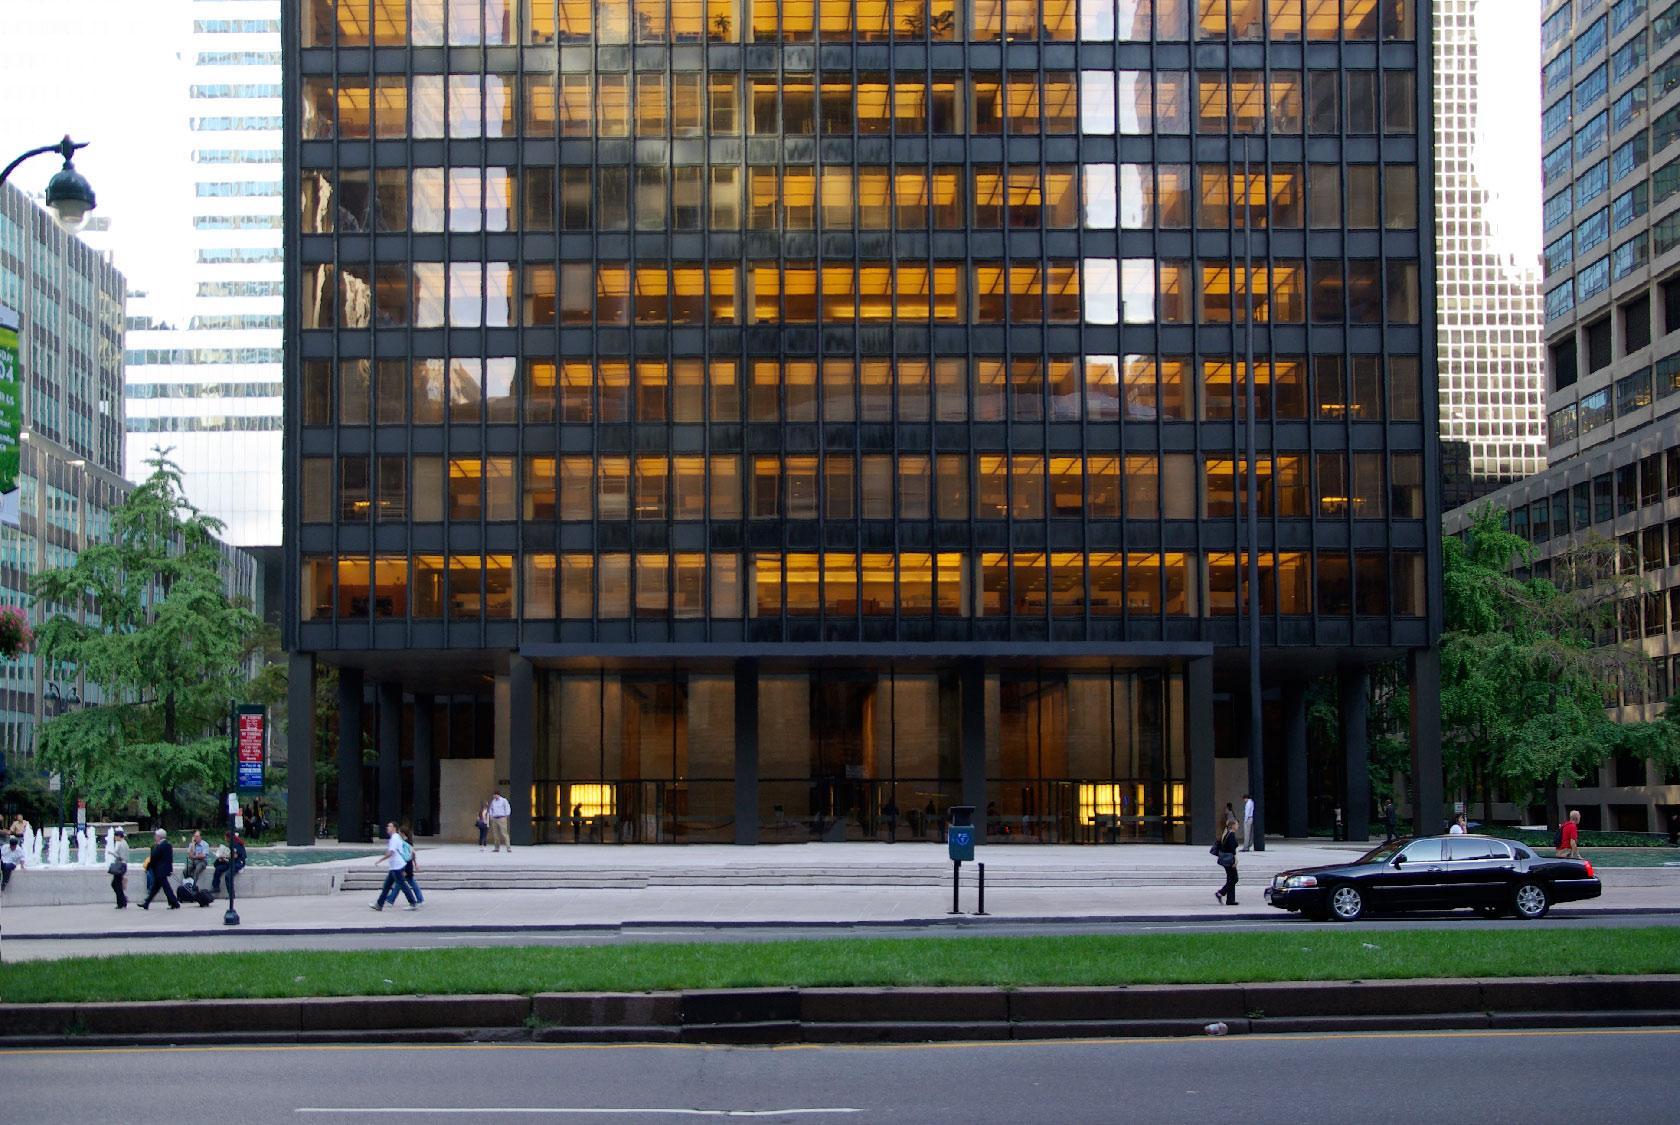 File:Seagram Building-NewYork-3.jpg - Wikimedia Commons